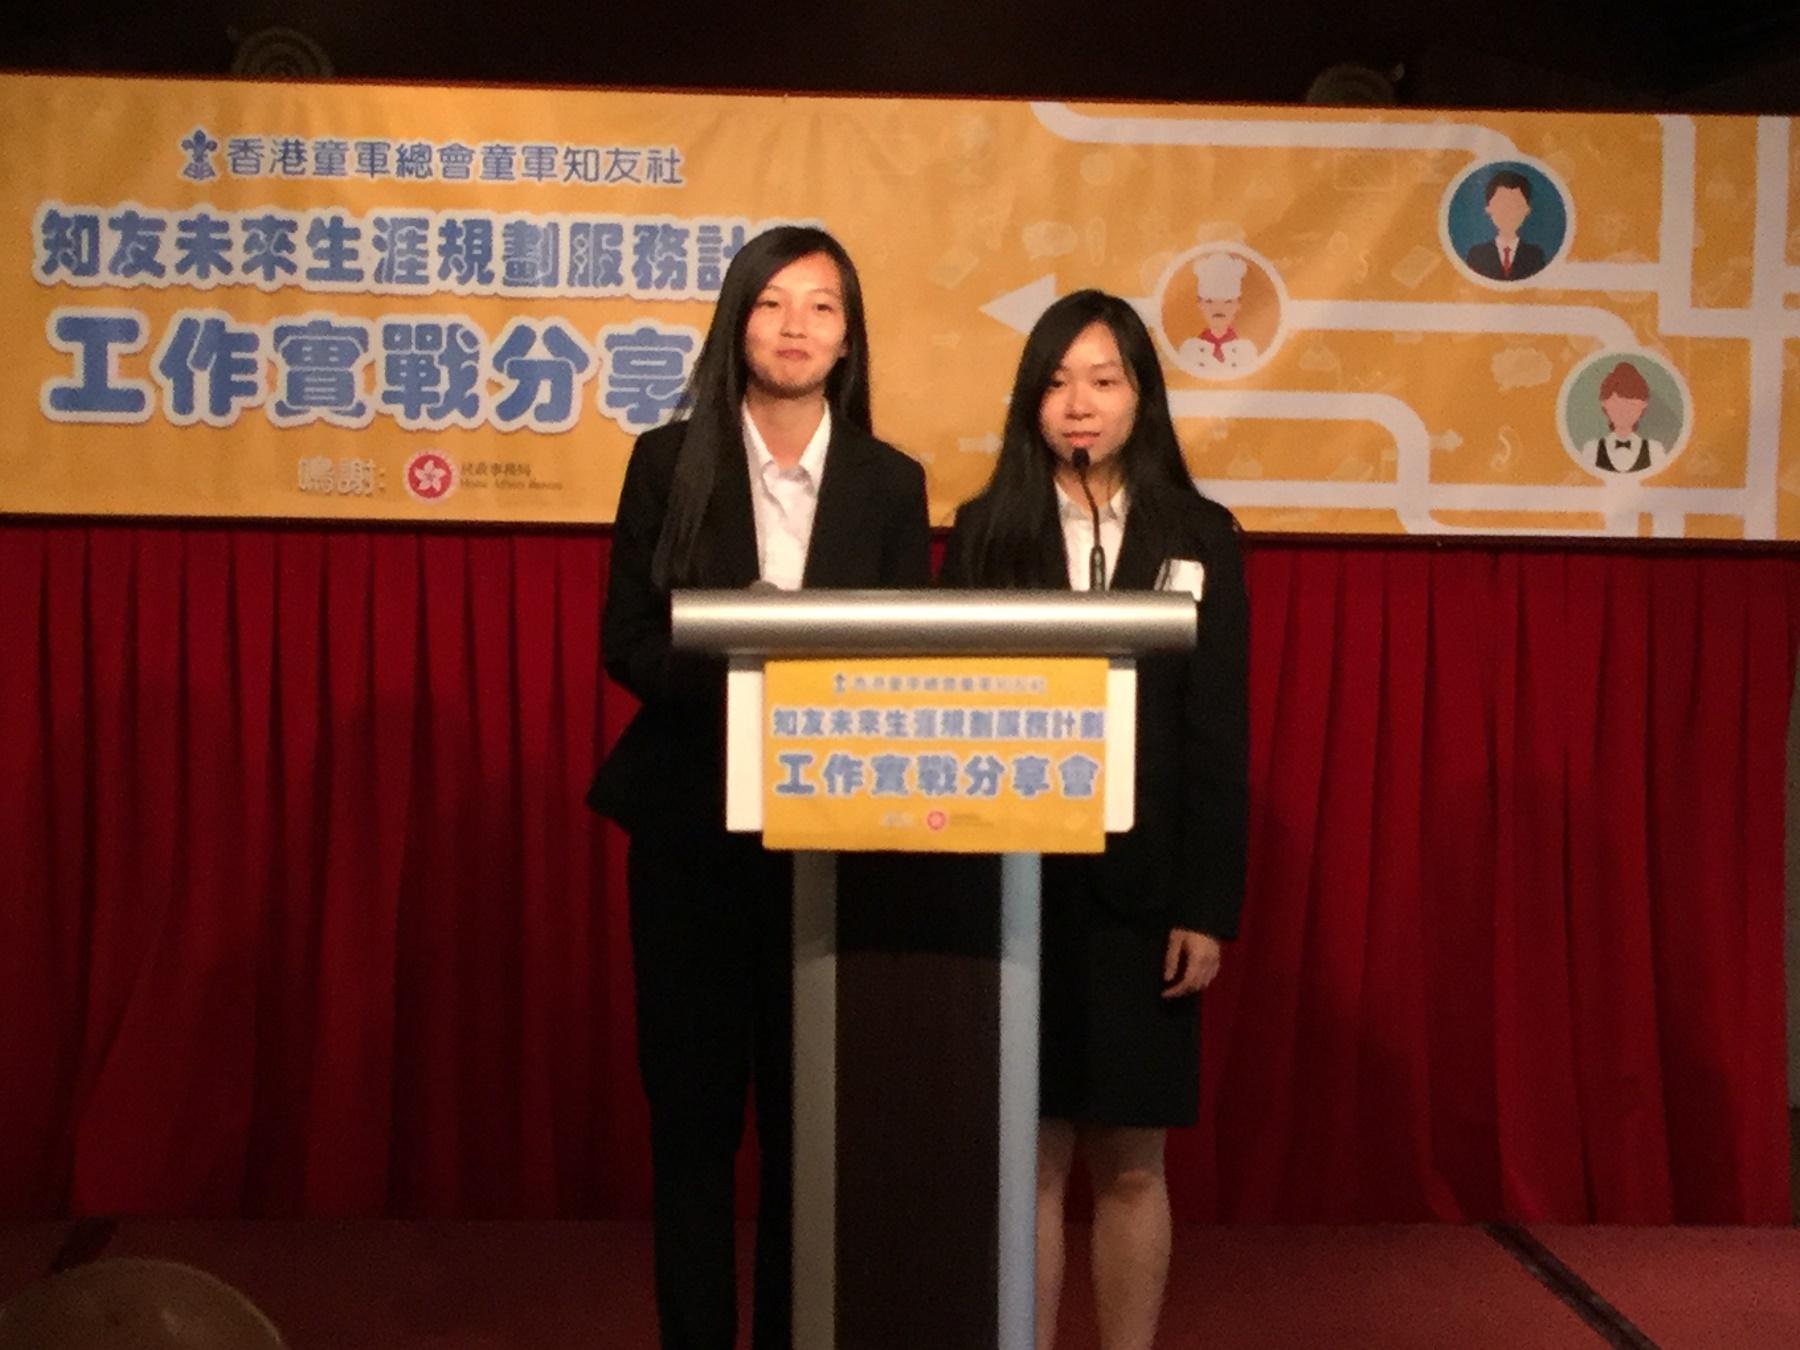 http://www.npc.edu.hk/sites/default/files/img_0027.jpg